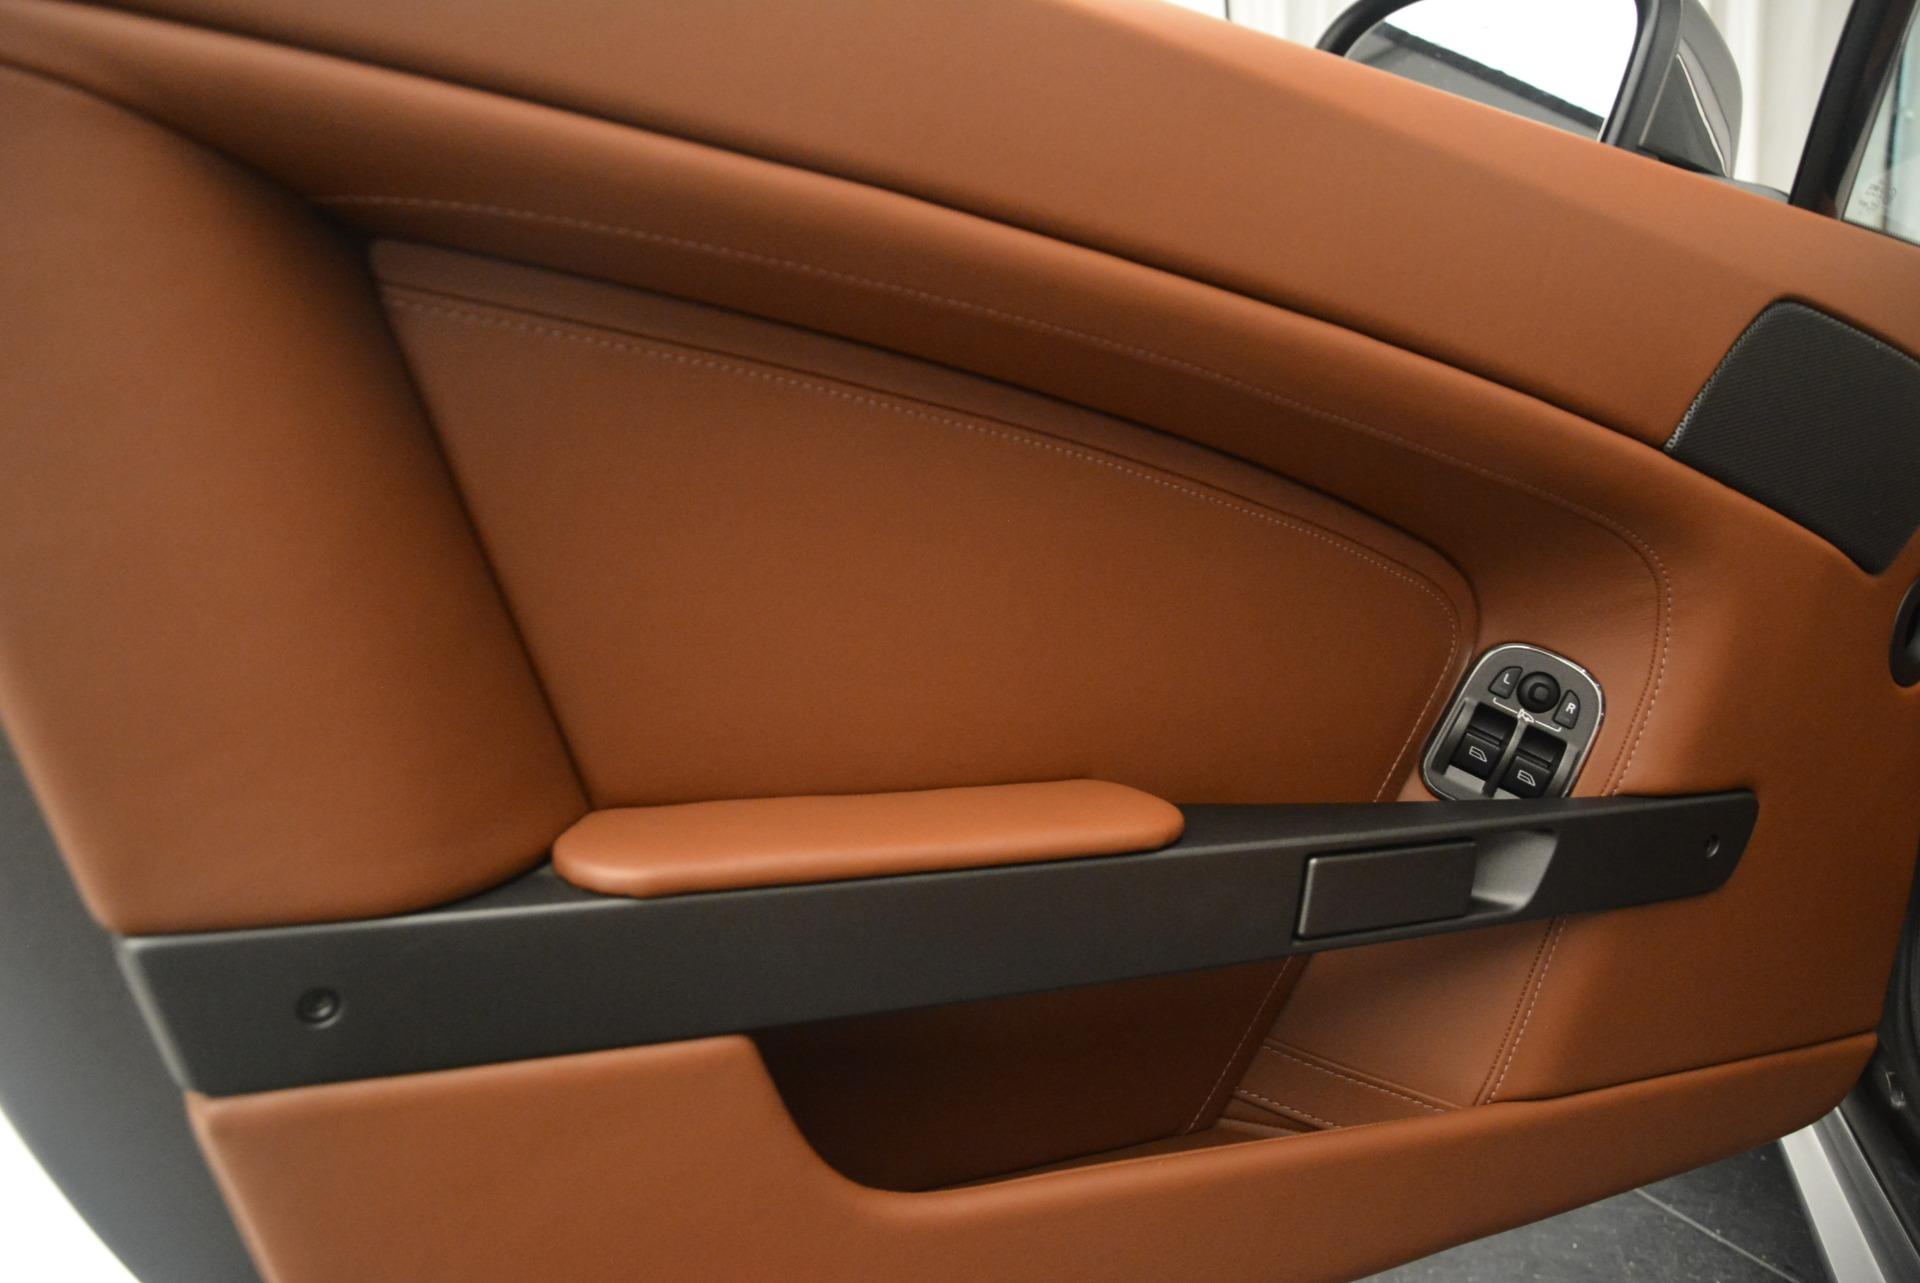 Used 2015 Aston Martin V8 Vantage Roadster For Sale In Westport, CT 2463_p22